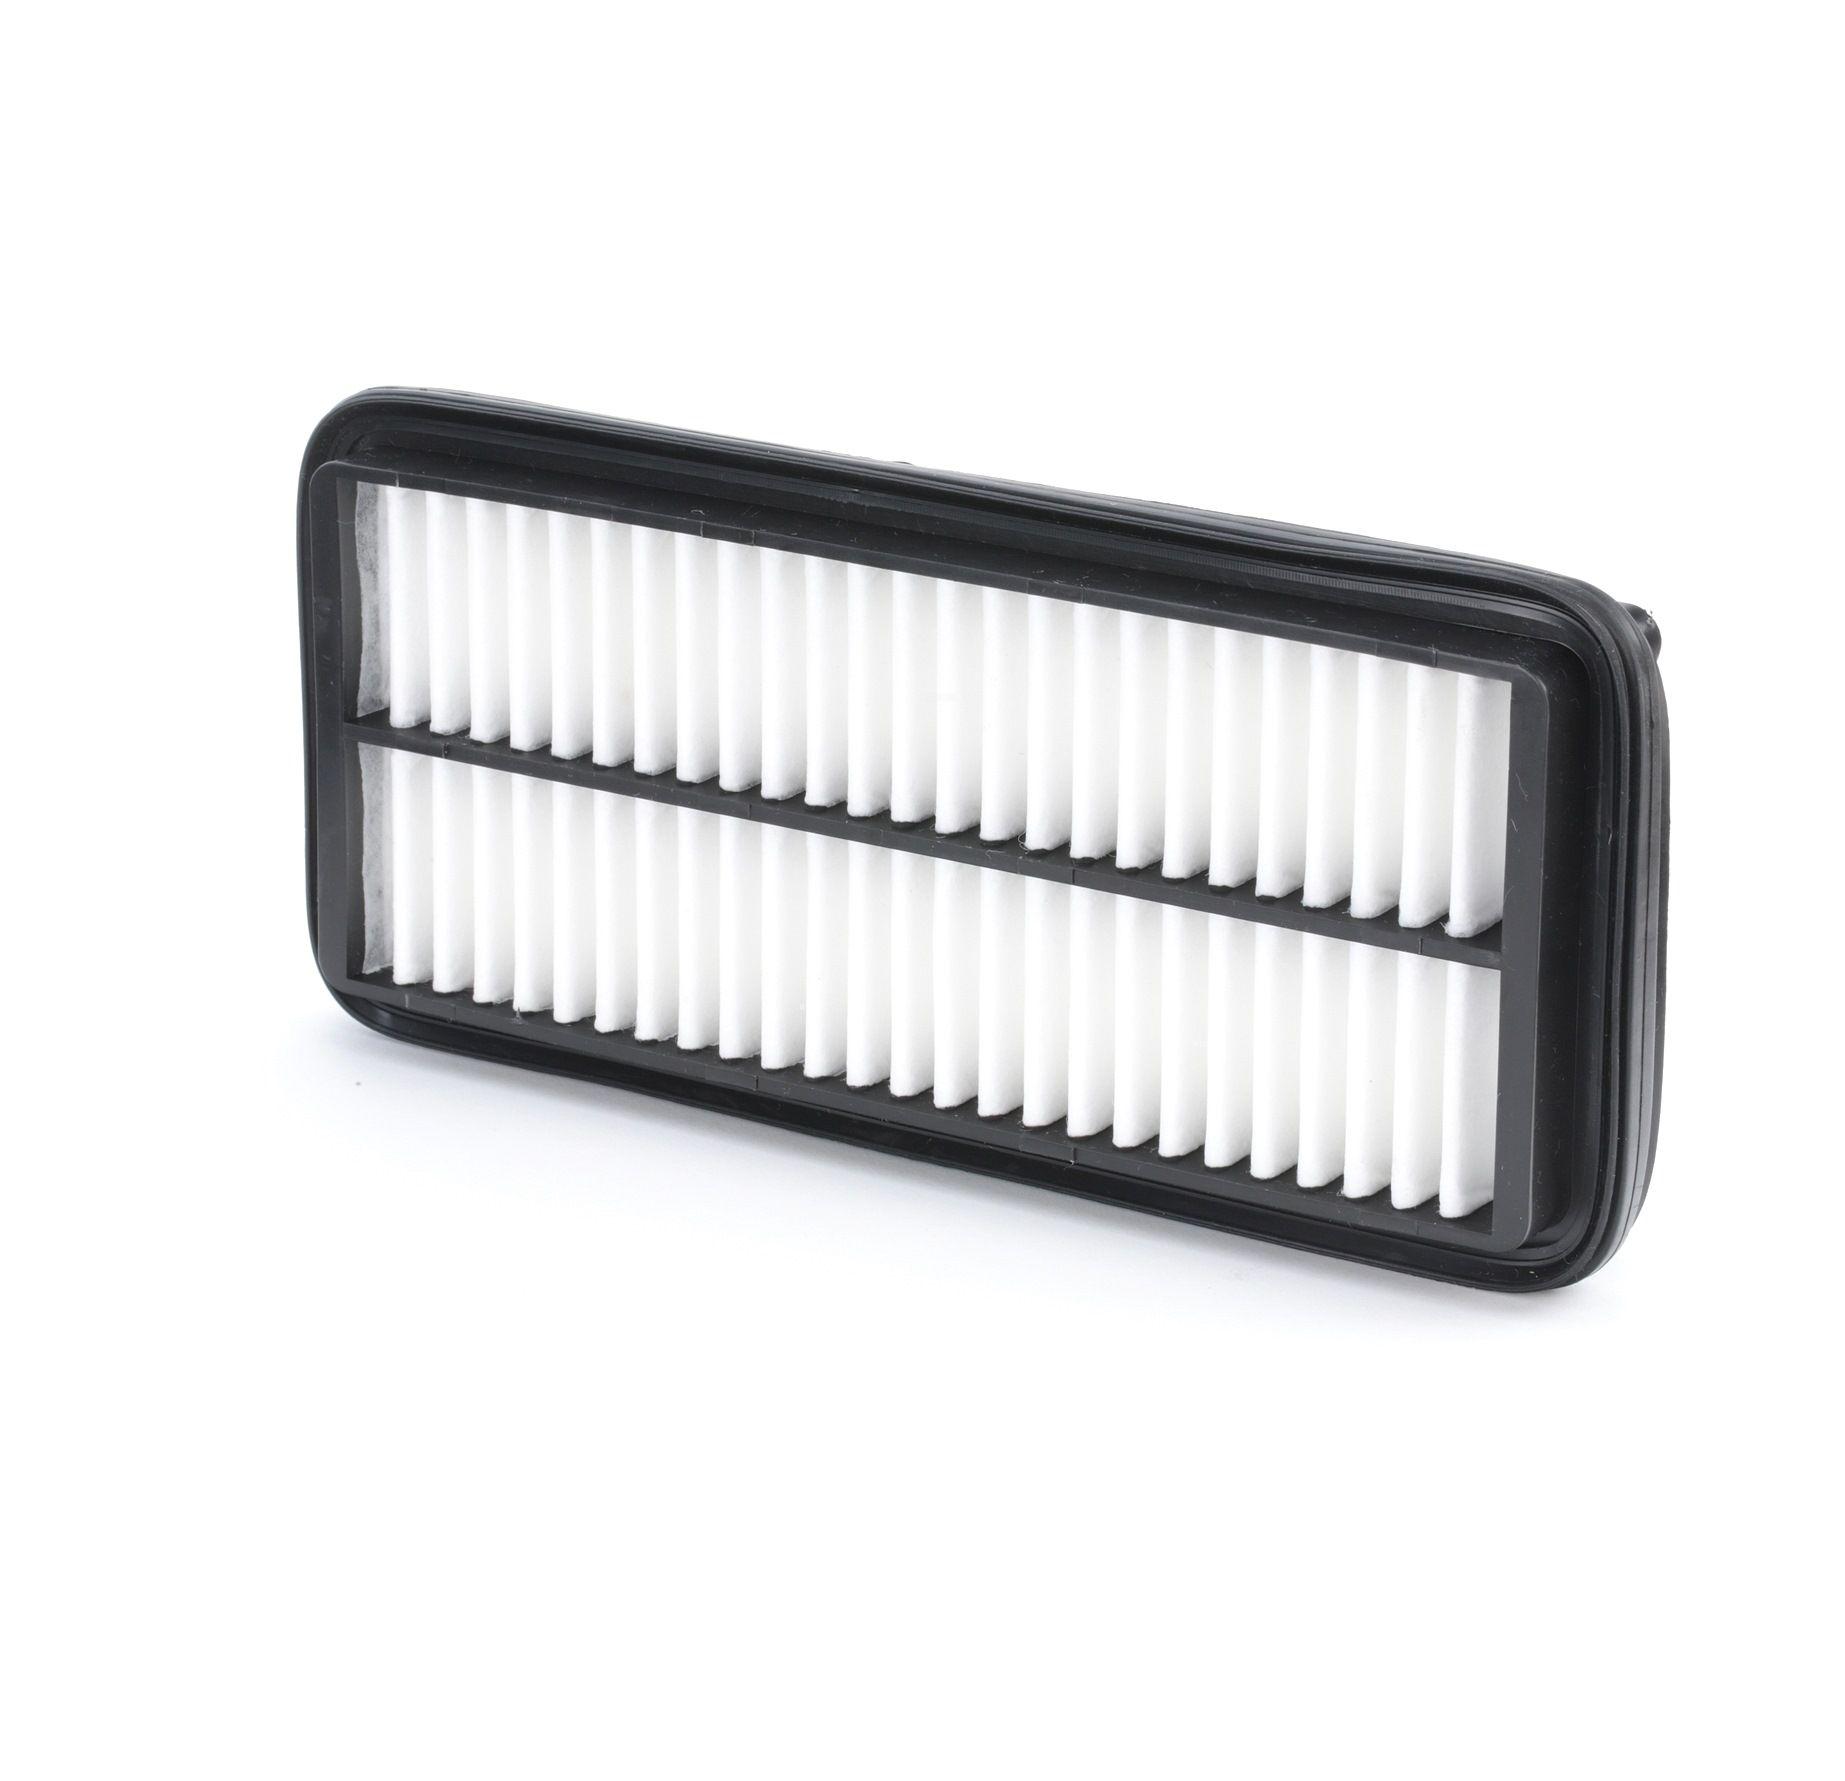 Original Zracni filter 8A0177 Kia